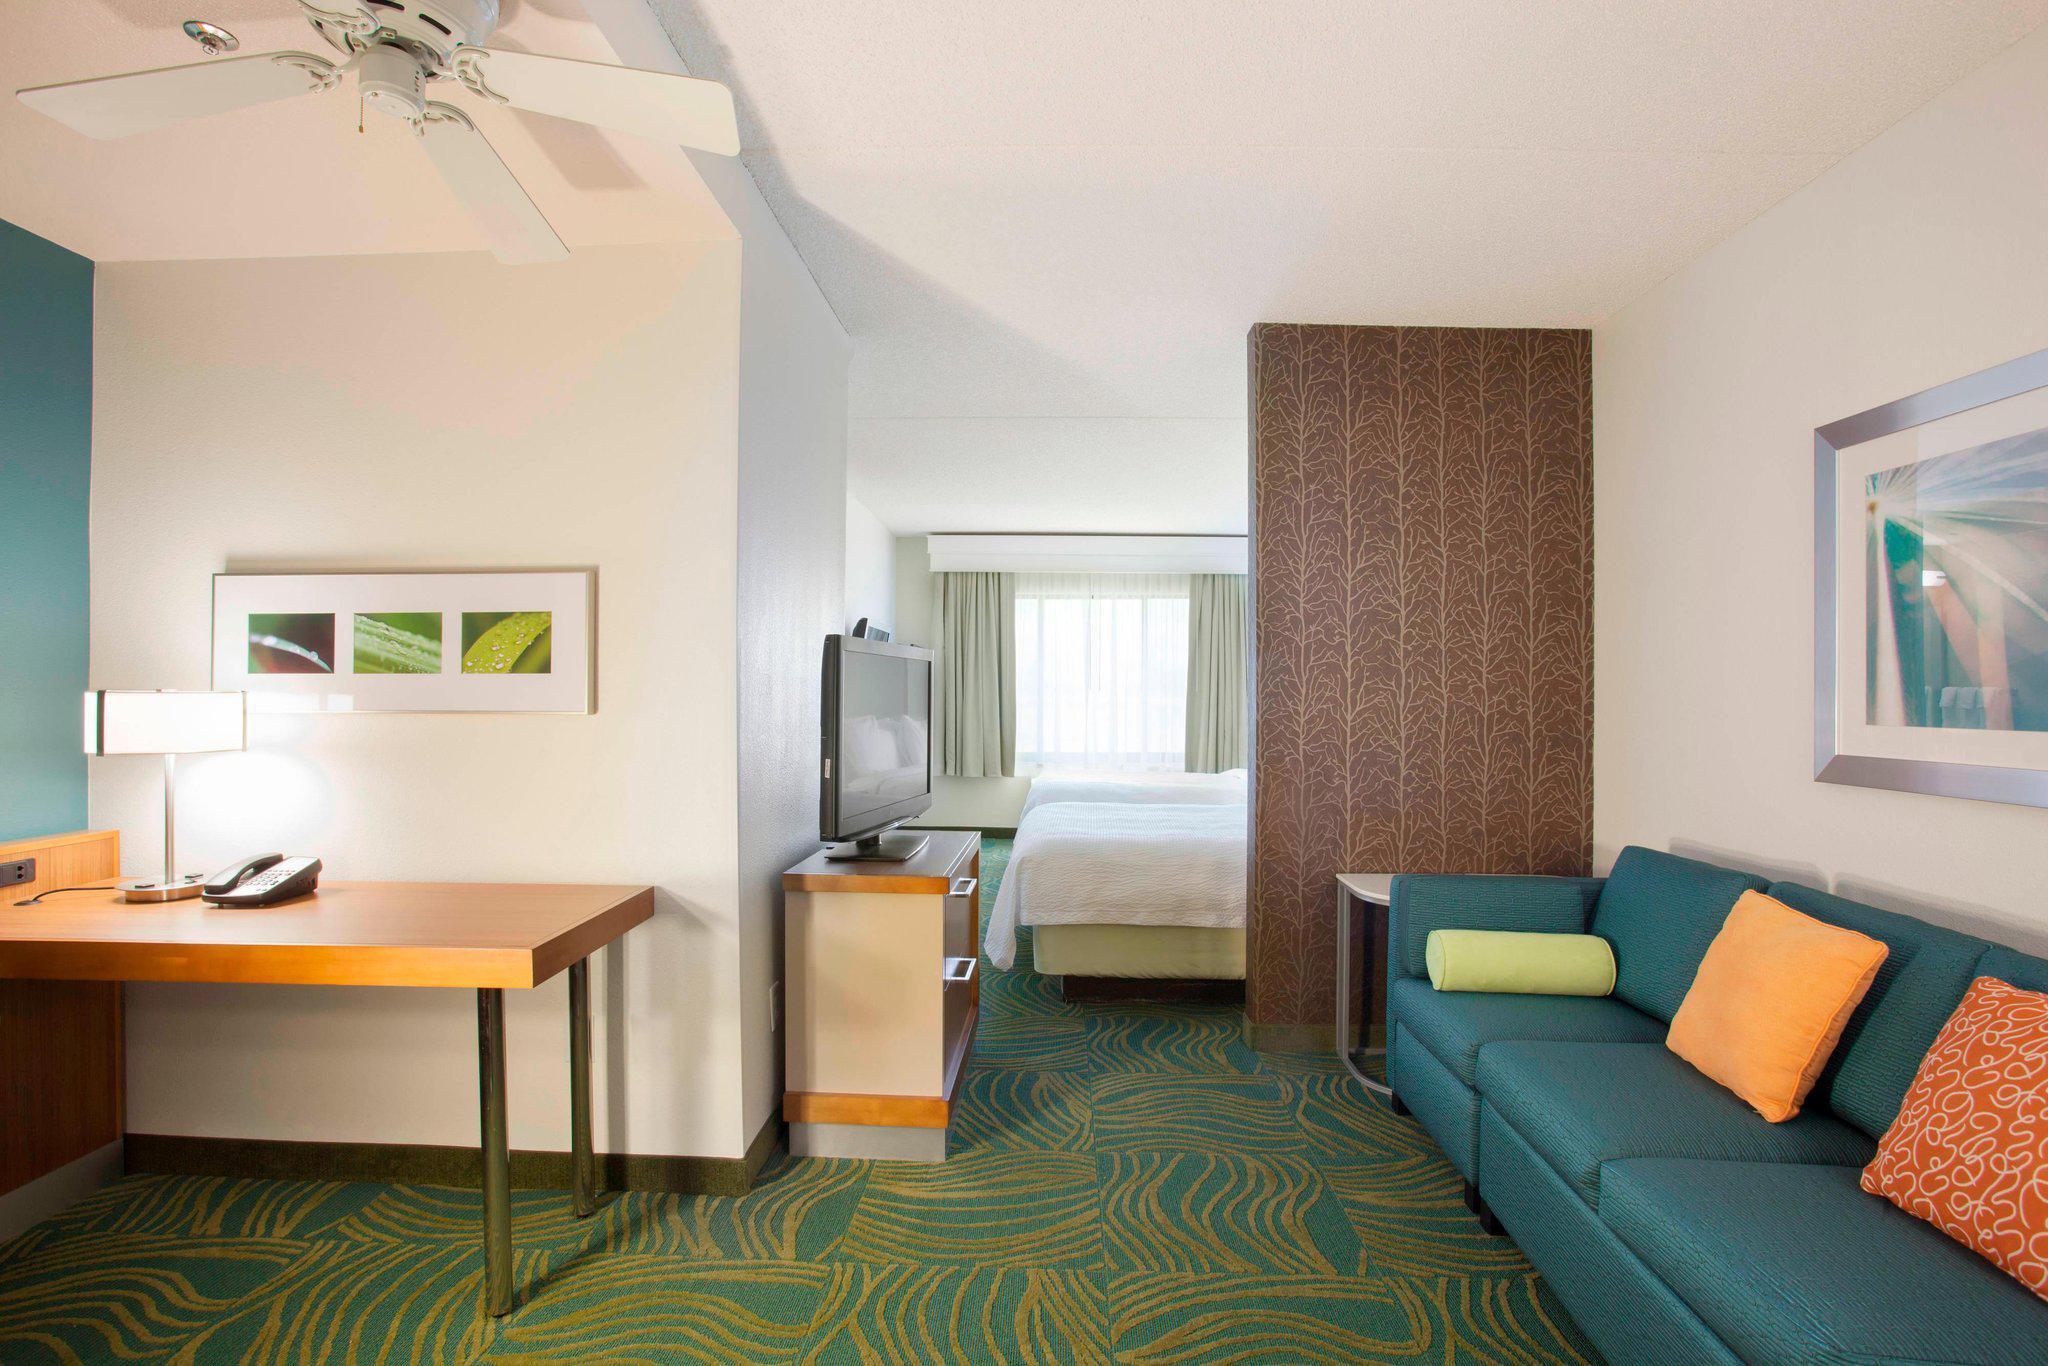 SpringHill Suites by Marriott Phoenix Tempe/Airport